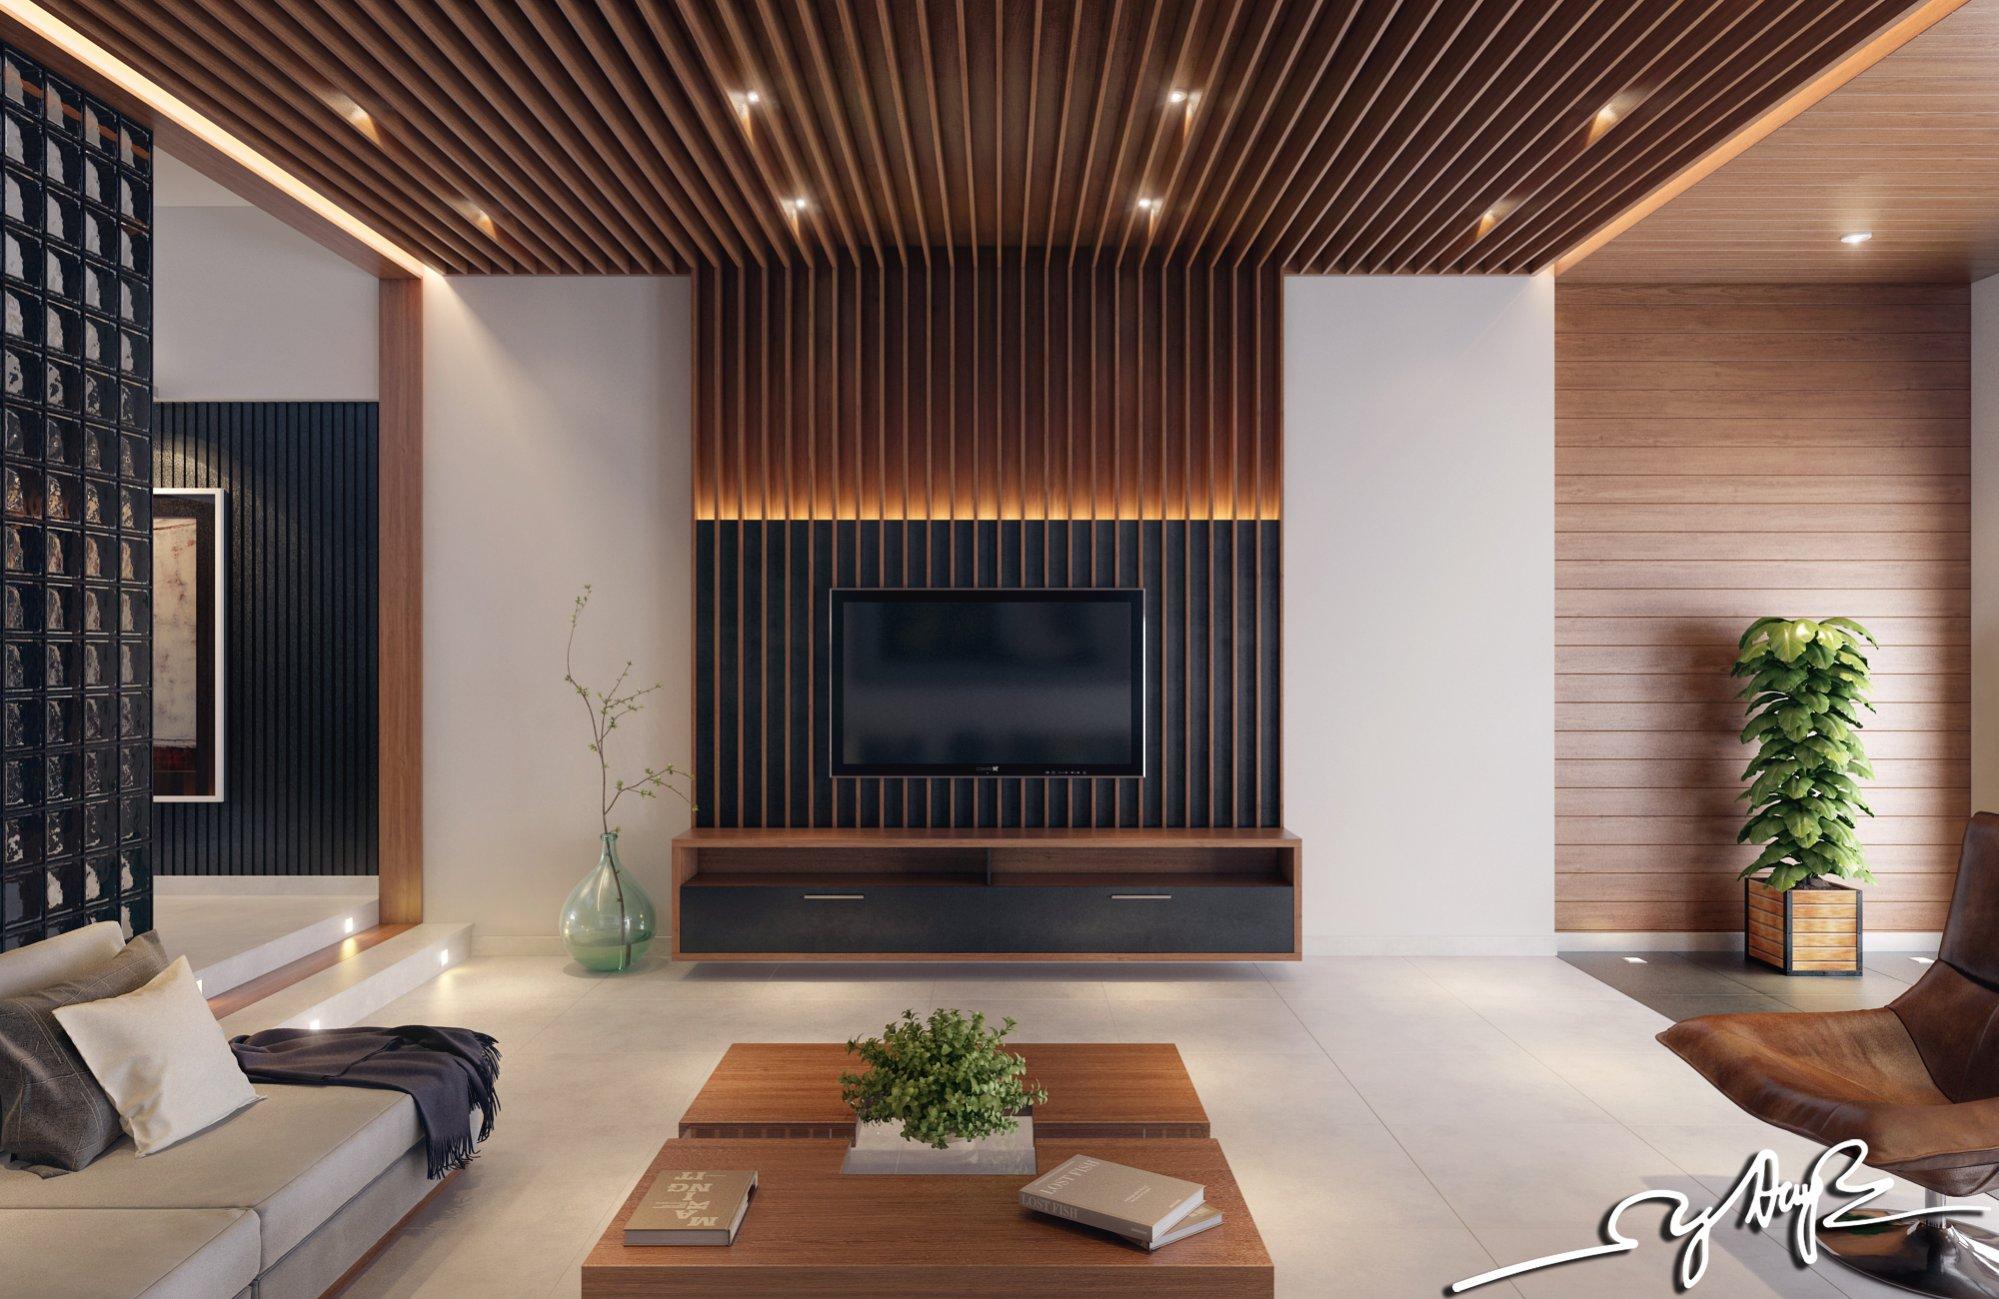 wood wall interior design photo - 6